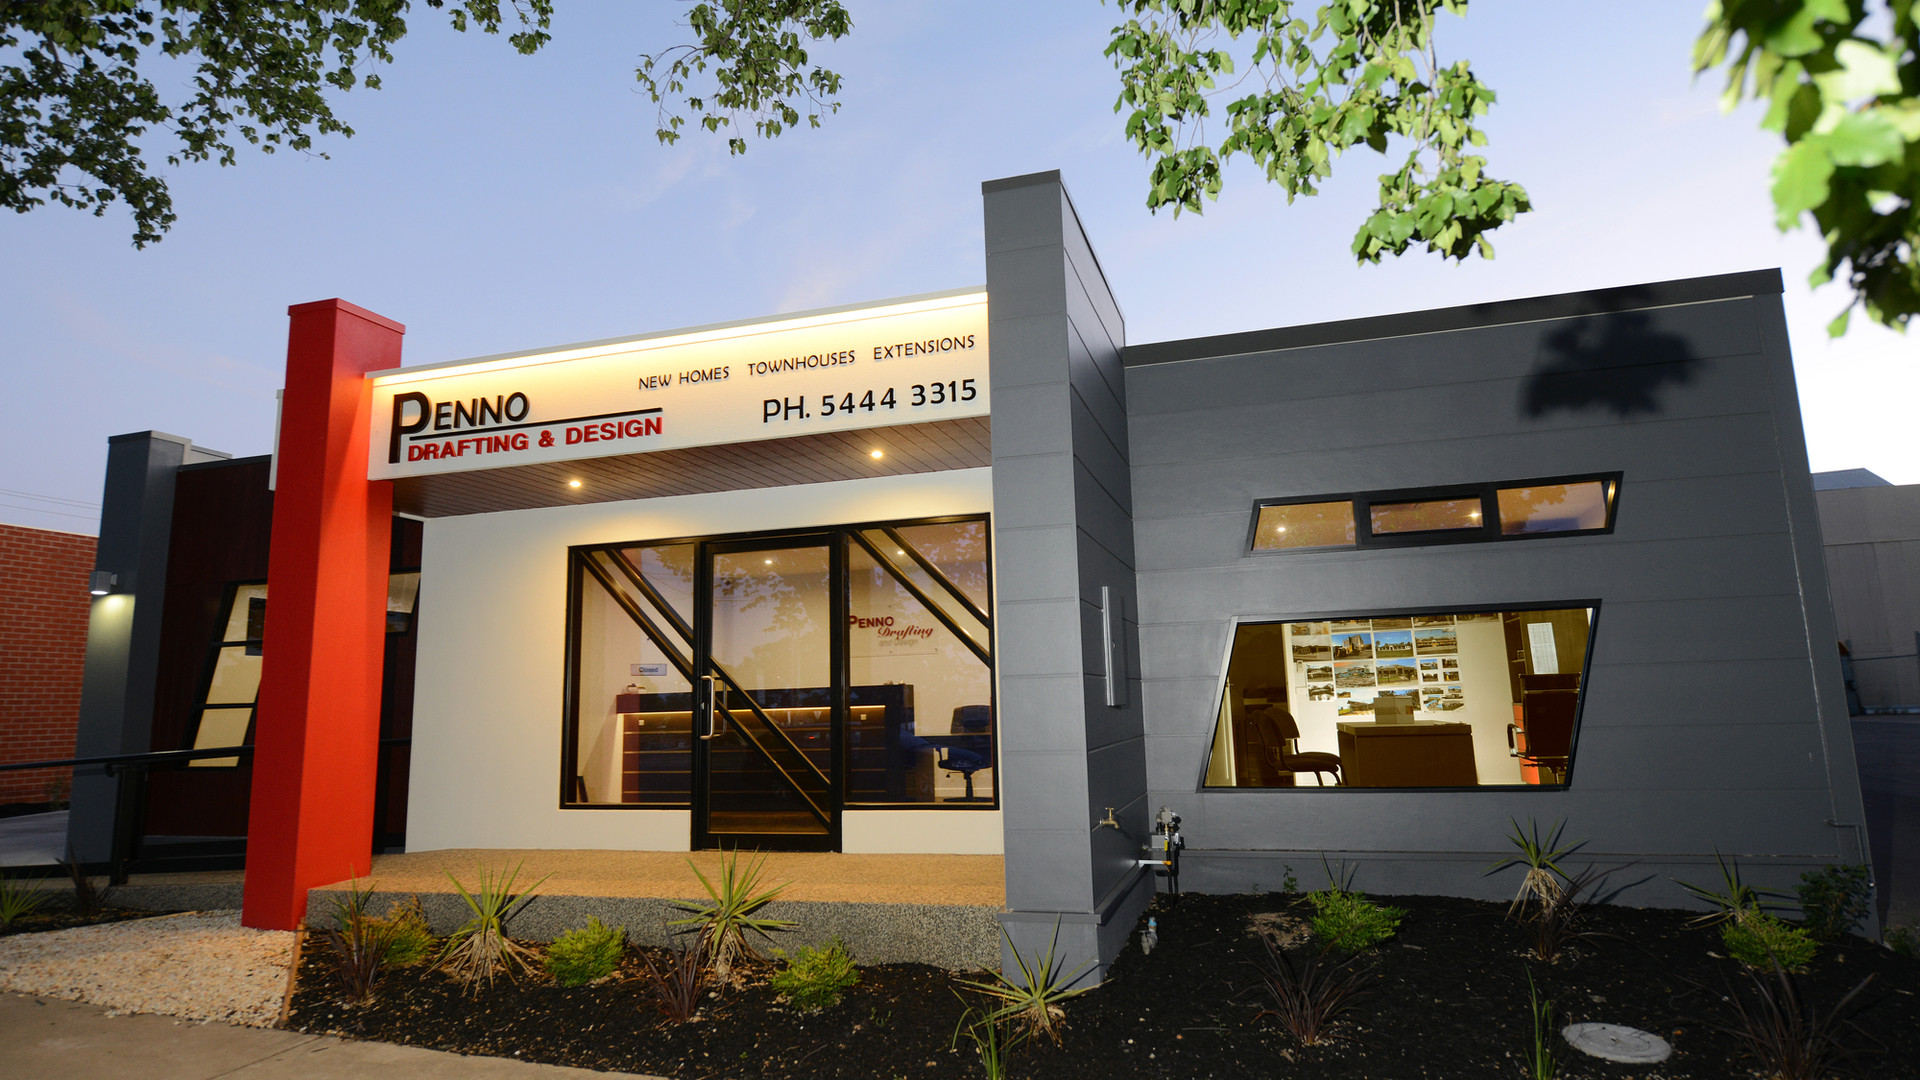 Penno Drafting & Design